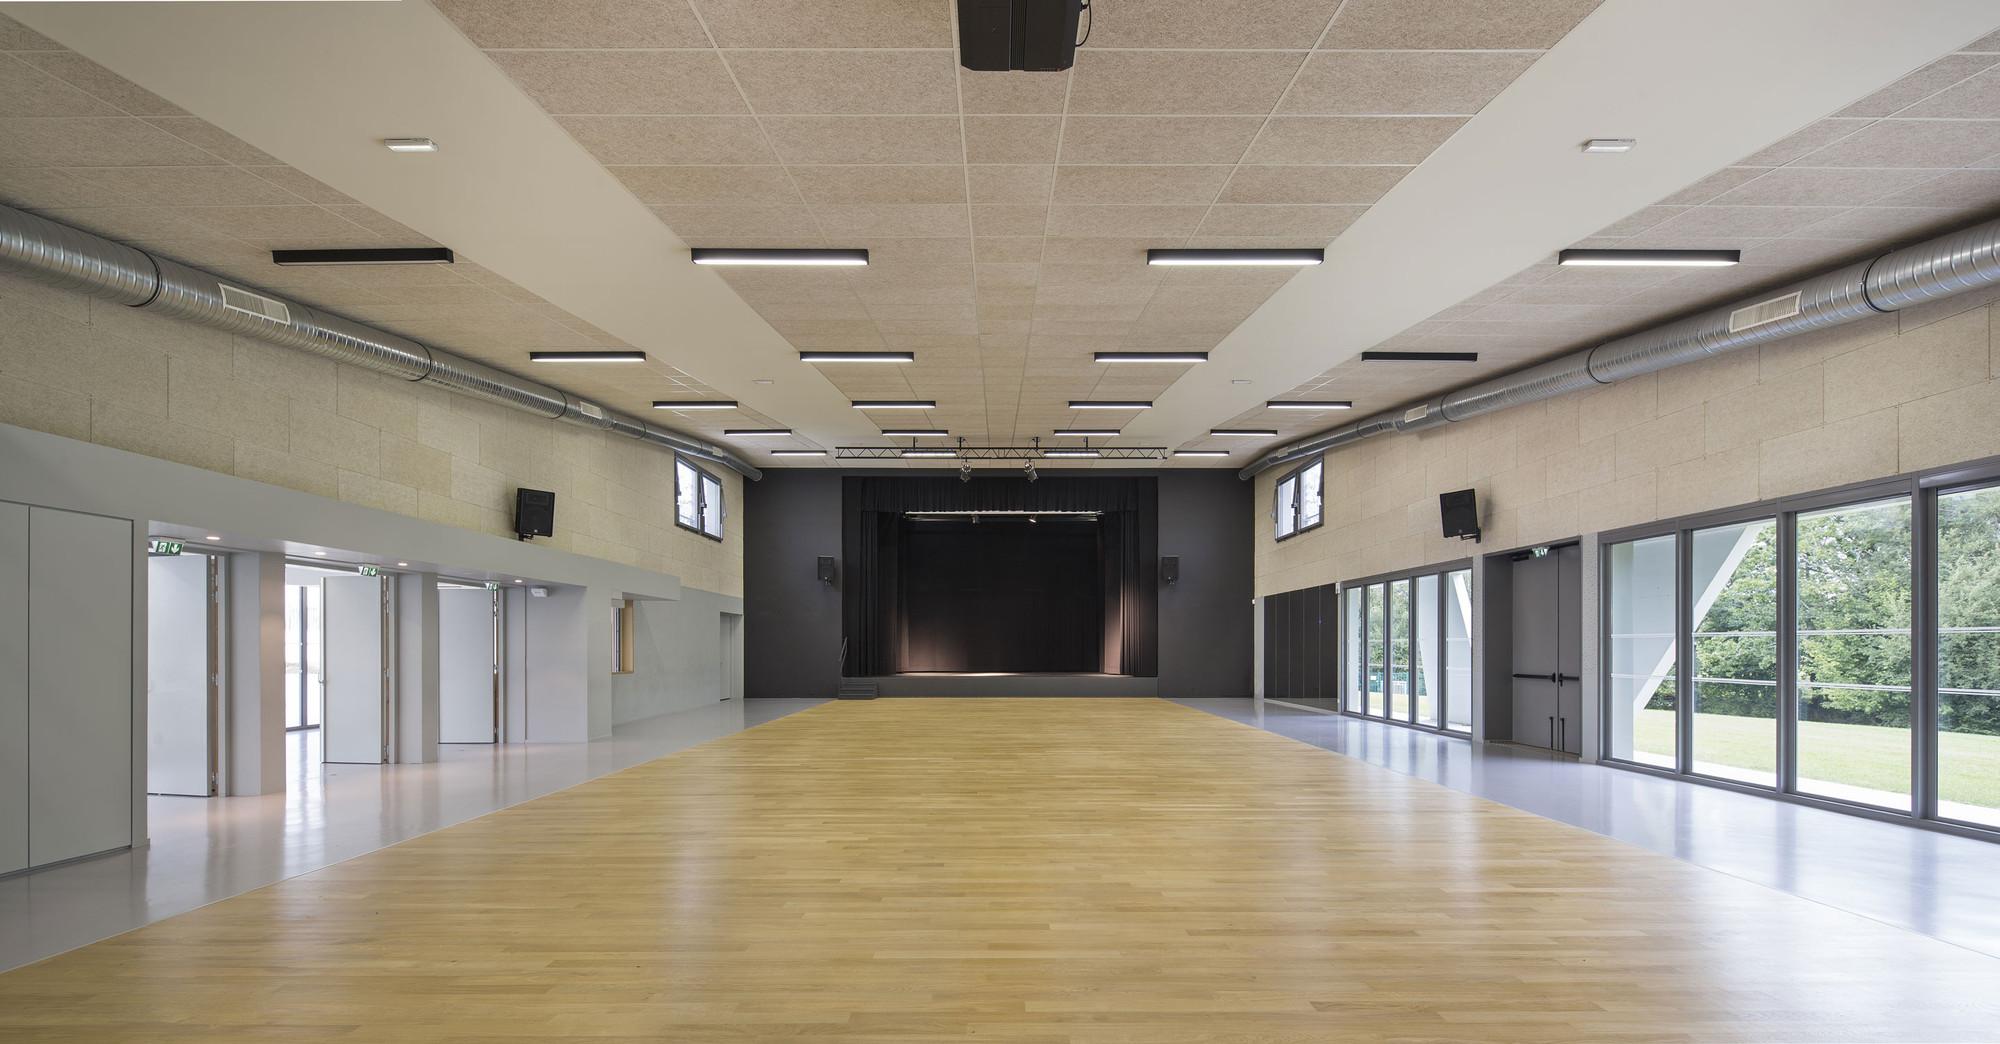 Gallery Of Salle Polyvalente De Plumergat Studio 02 2